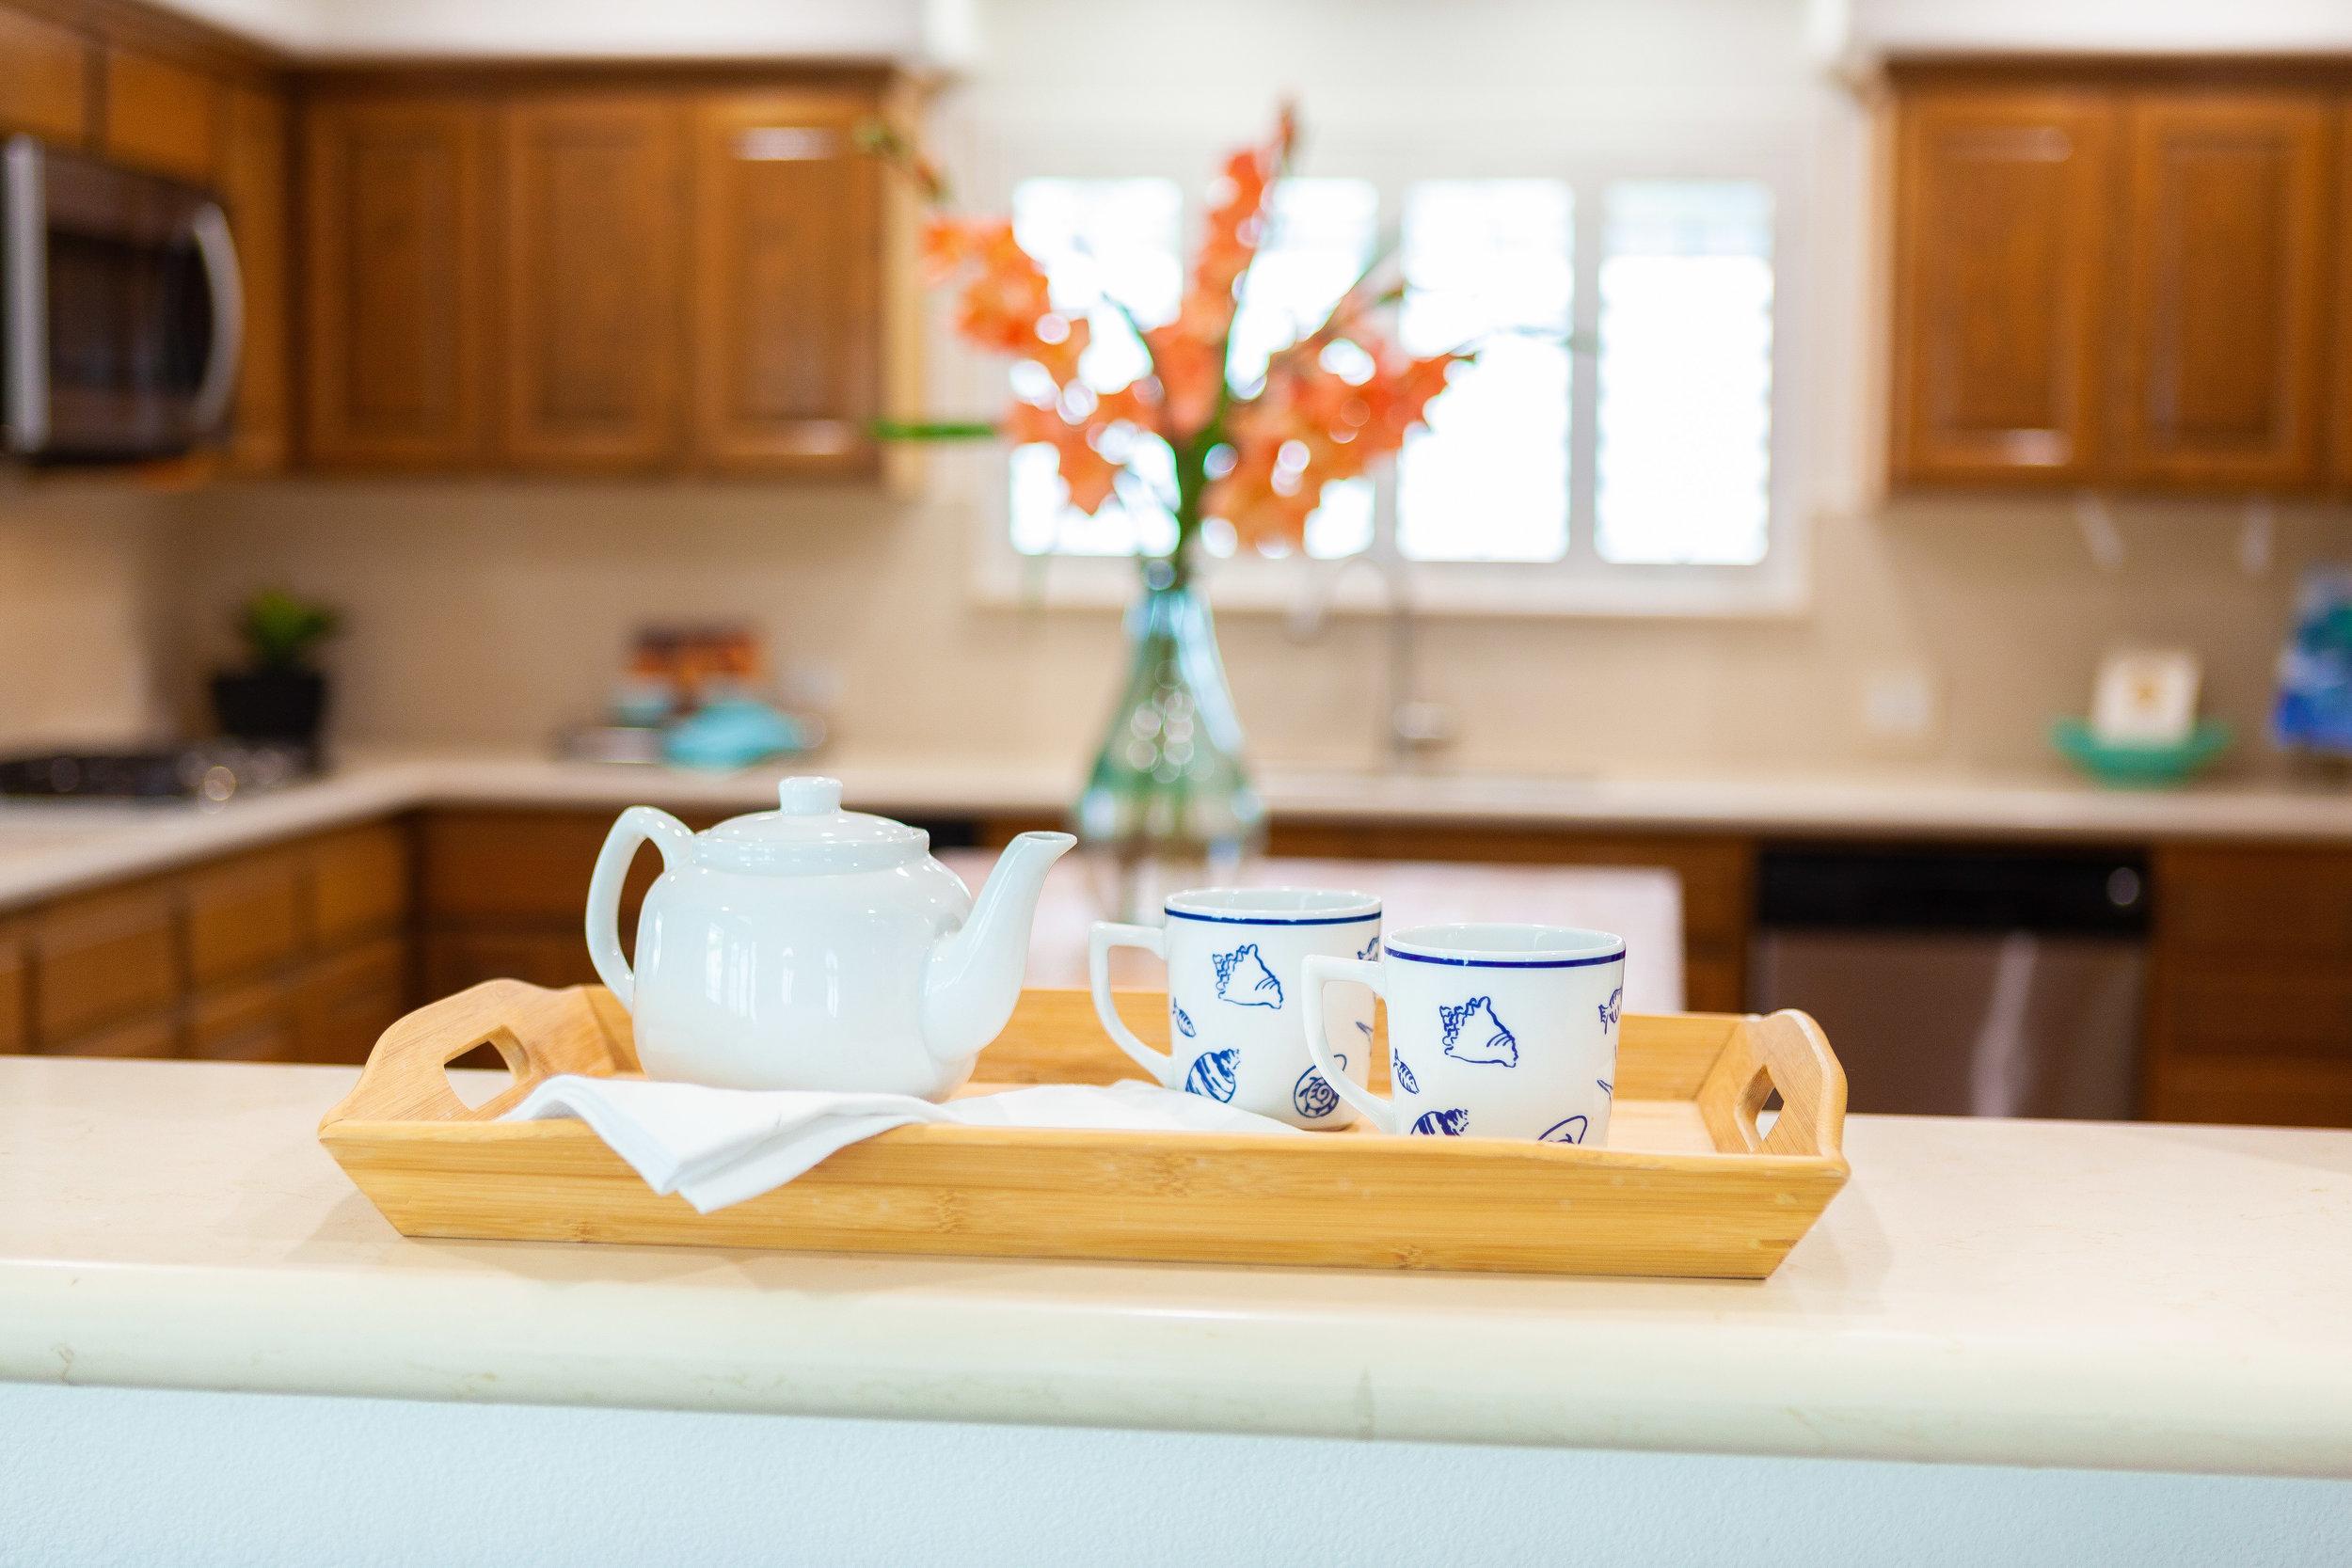 KitchenCounter.jpg